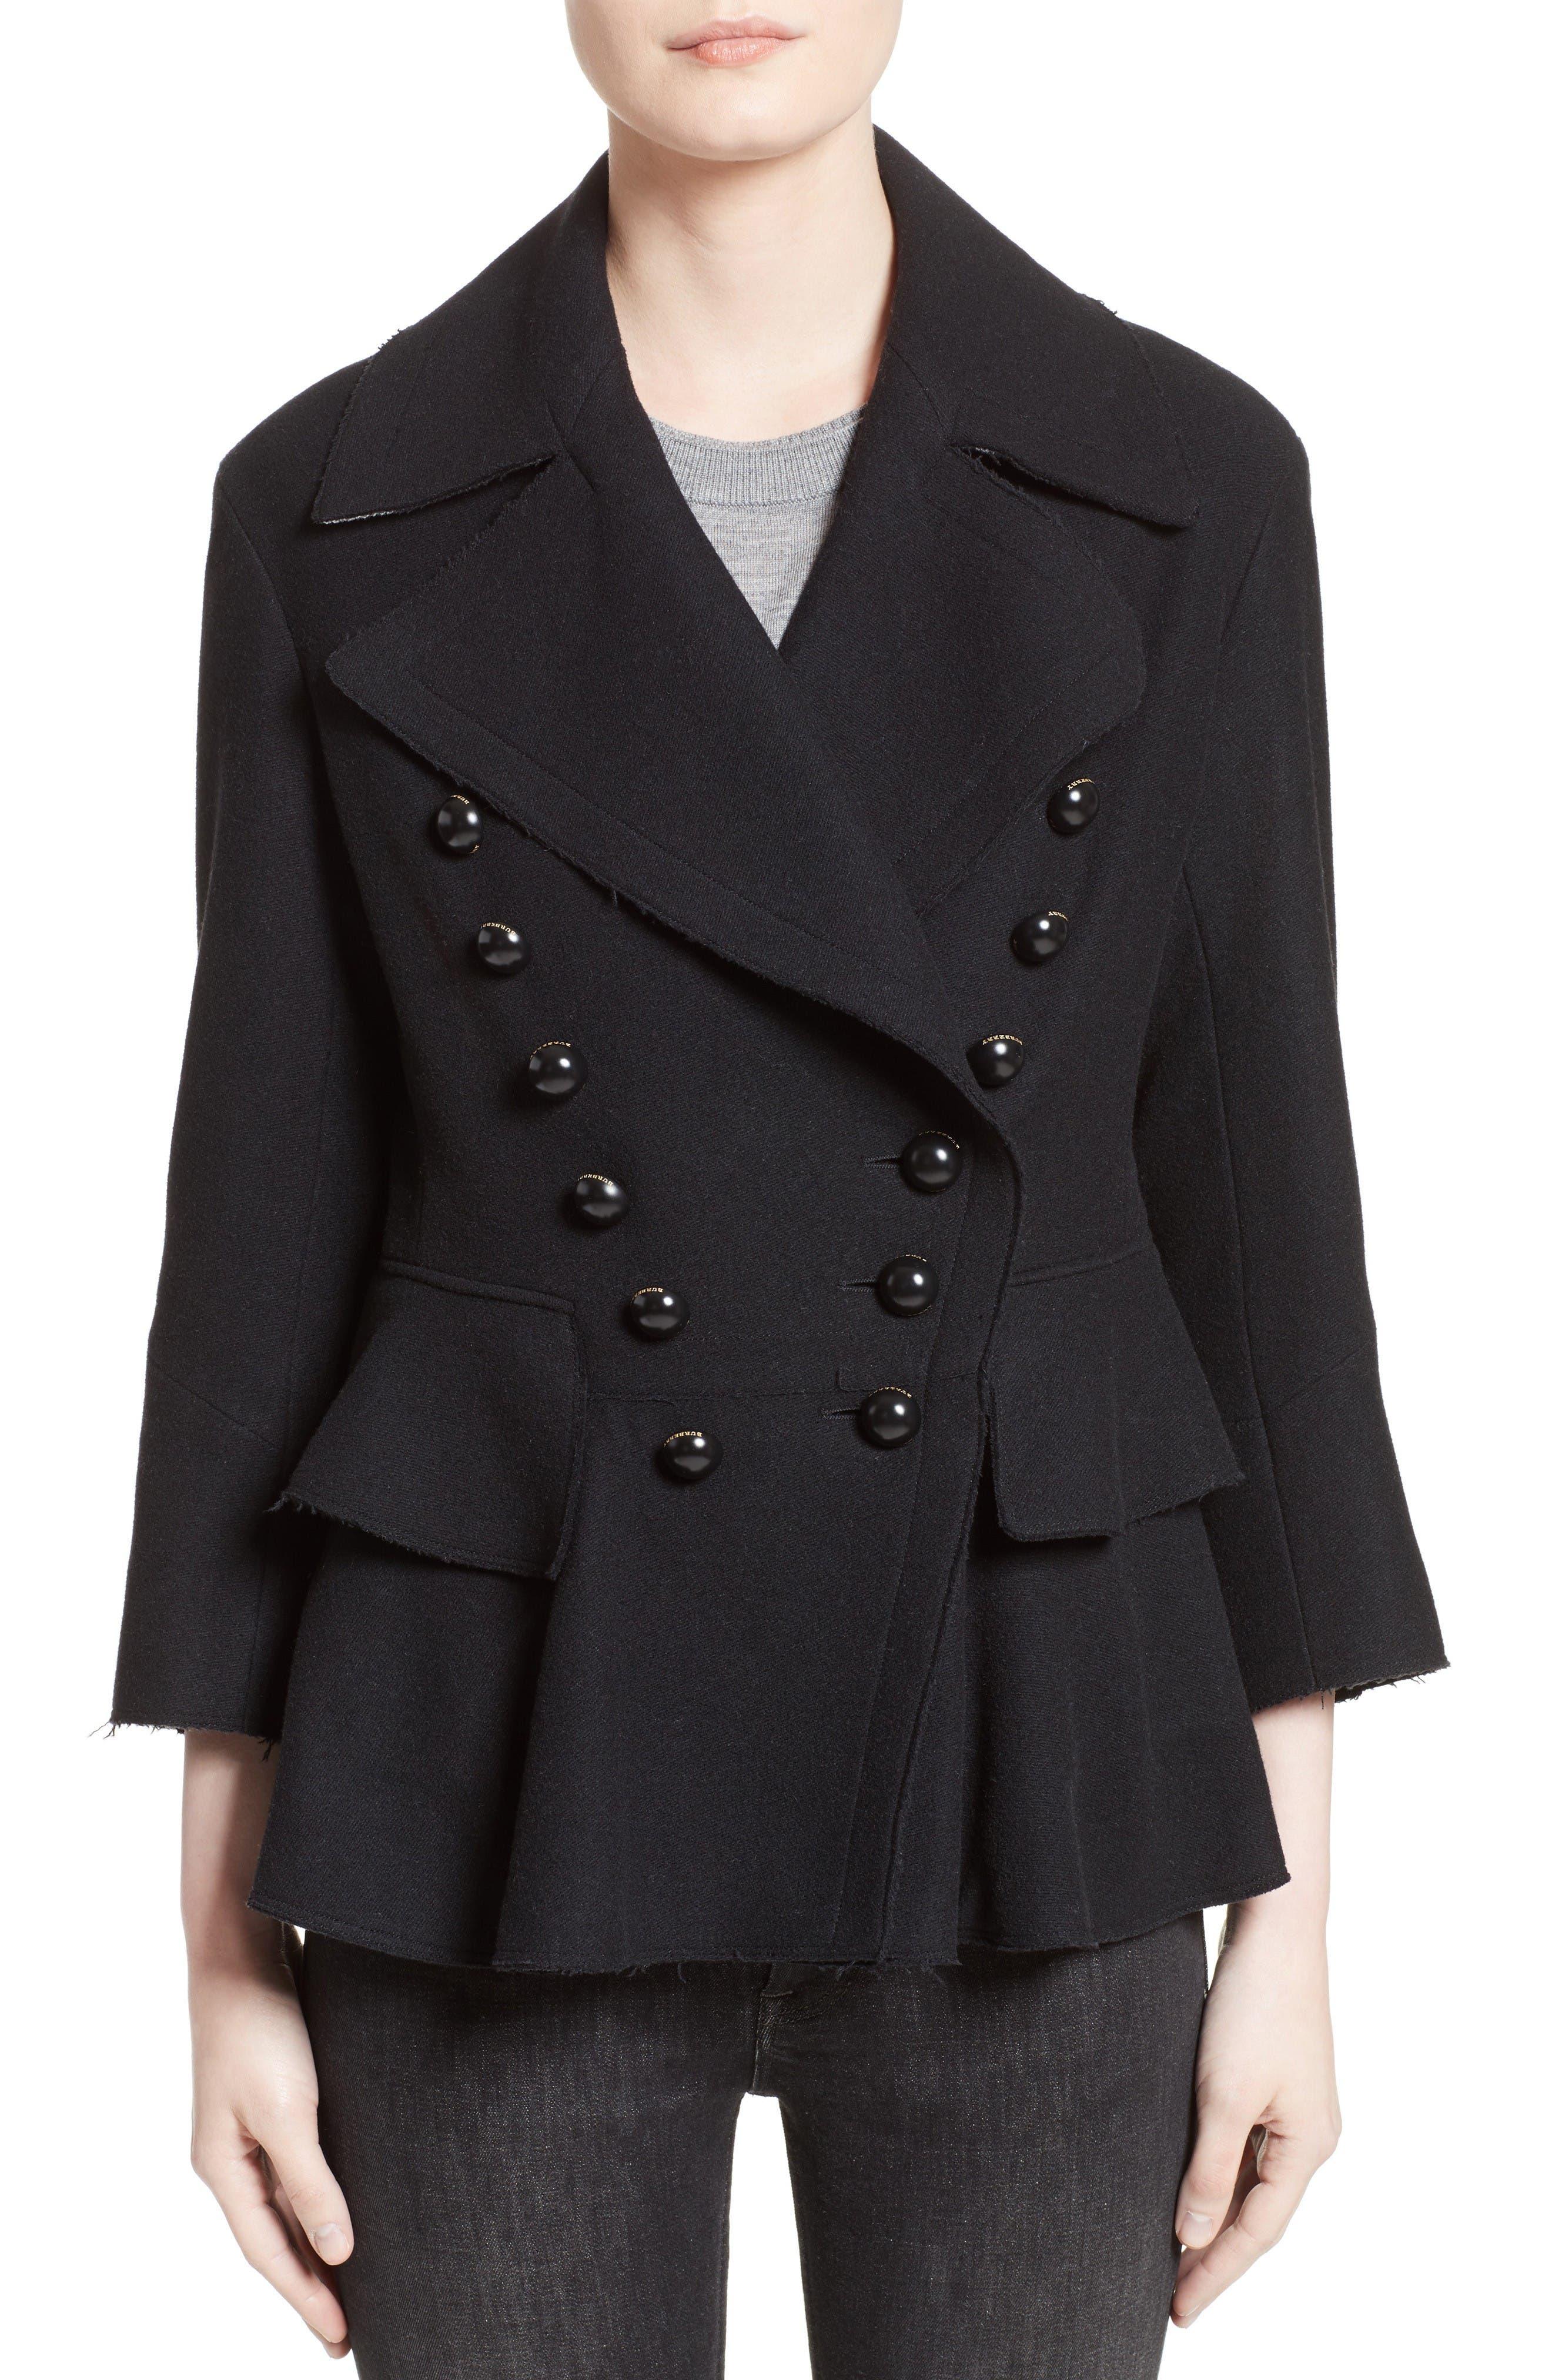 BURBERRY Alvingham Wool Blend Jacket